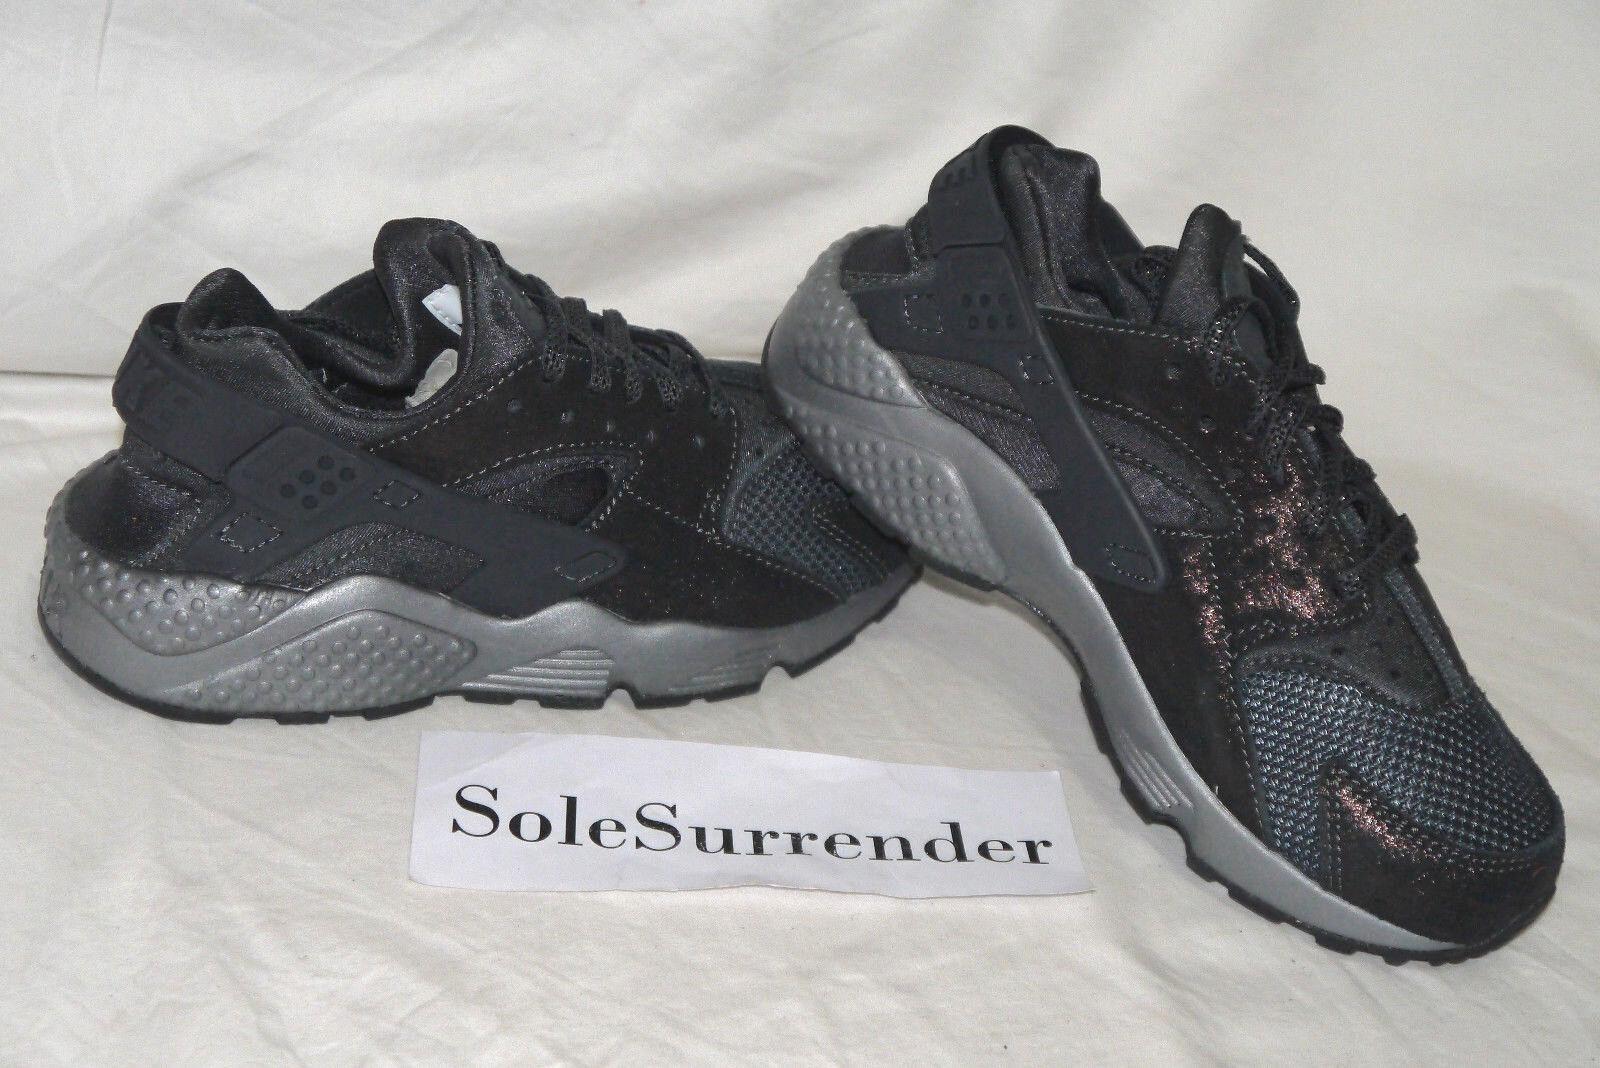 Women's Nike Air Huarache Run PRM - SIZE 6.5 - 683818-004 Black Grey Anthracite